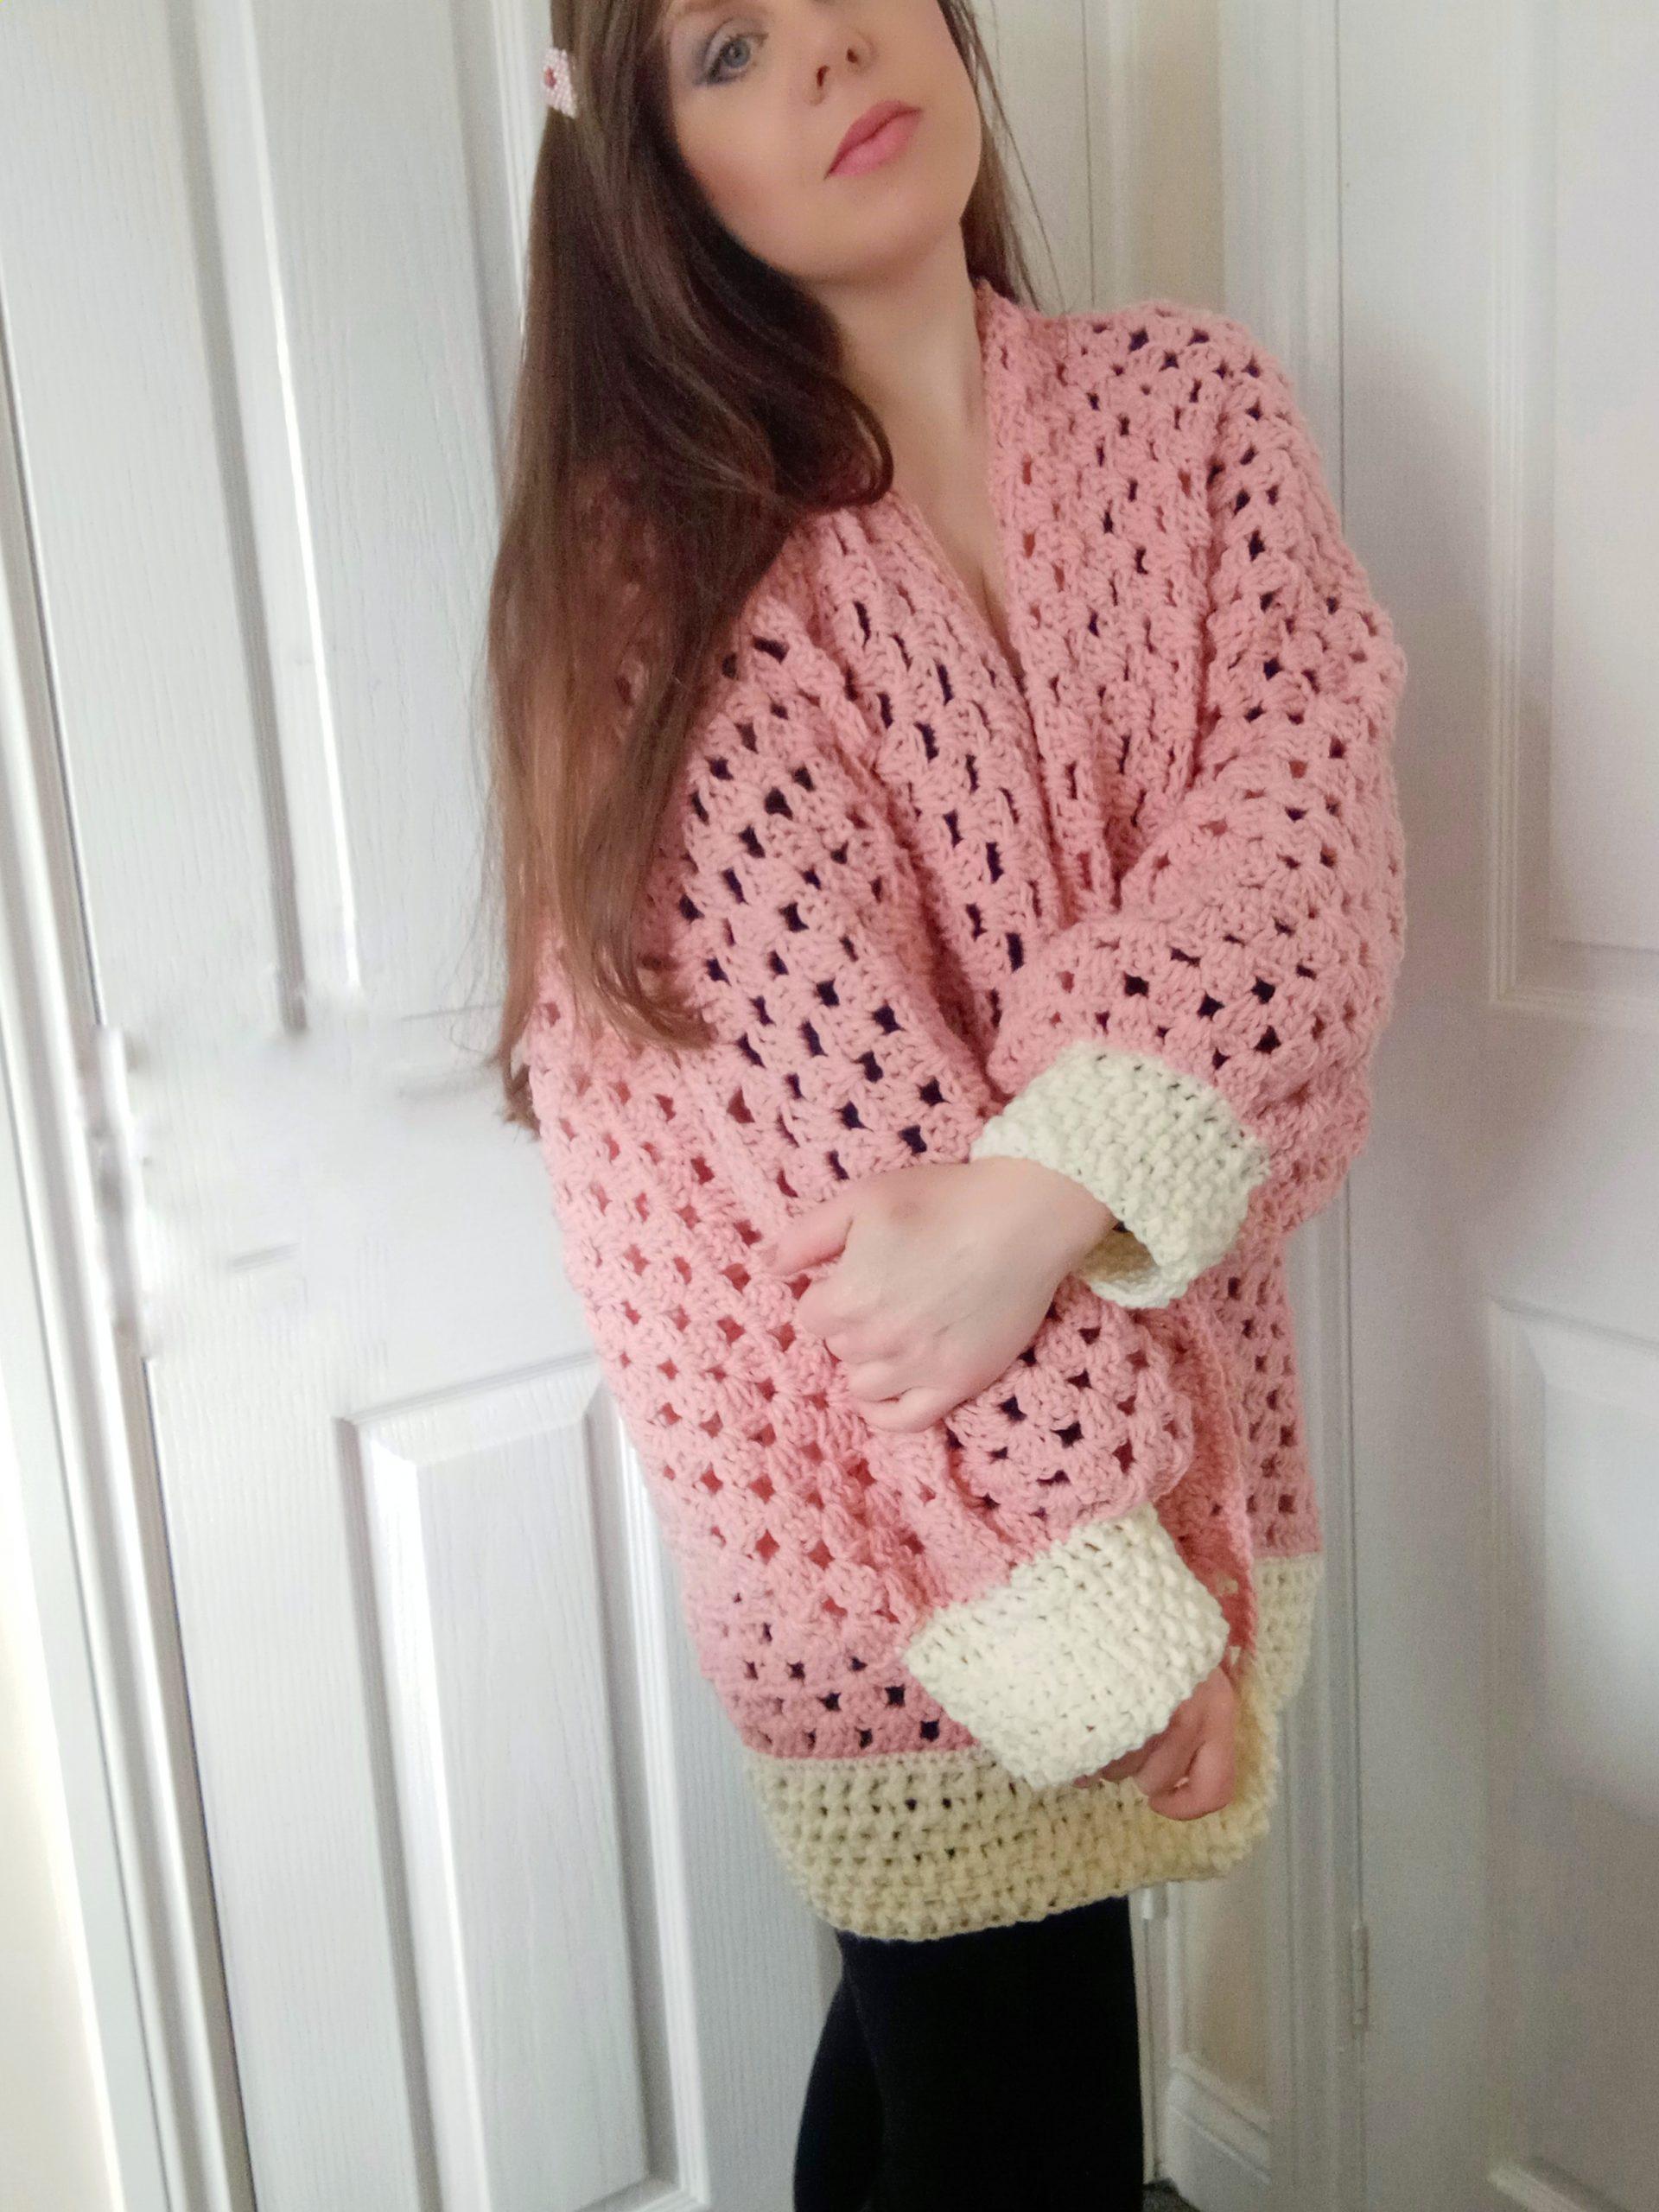 Crochet The Sweet Dreams Hexagon Cardigan